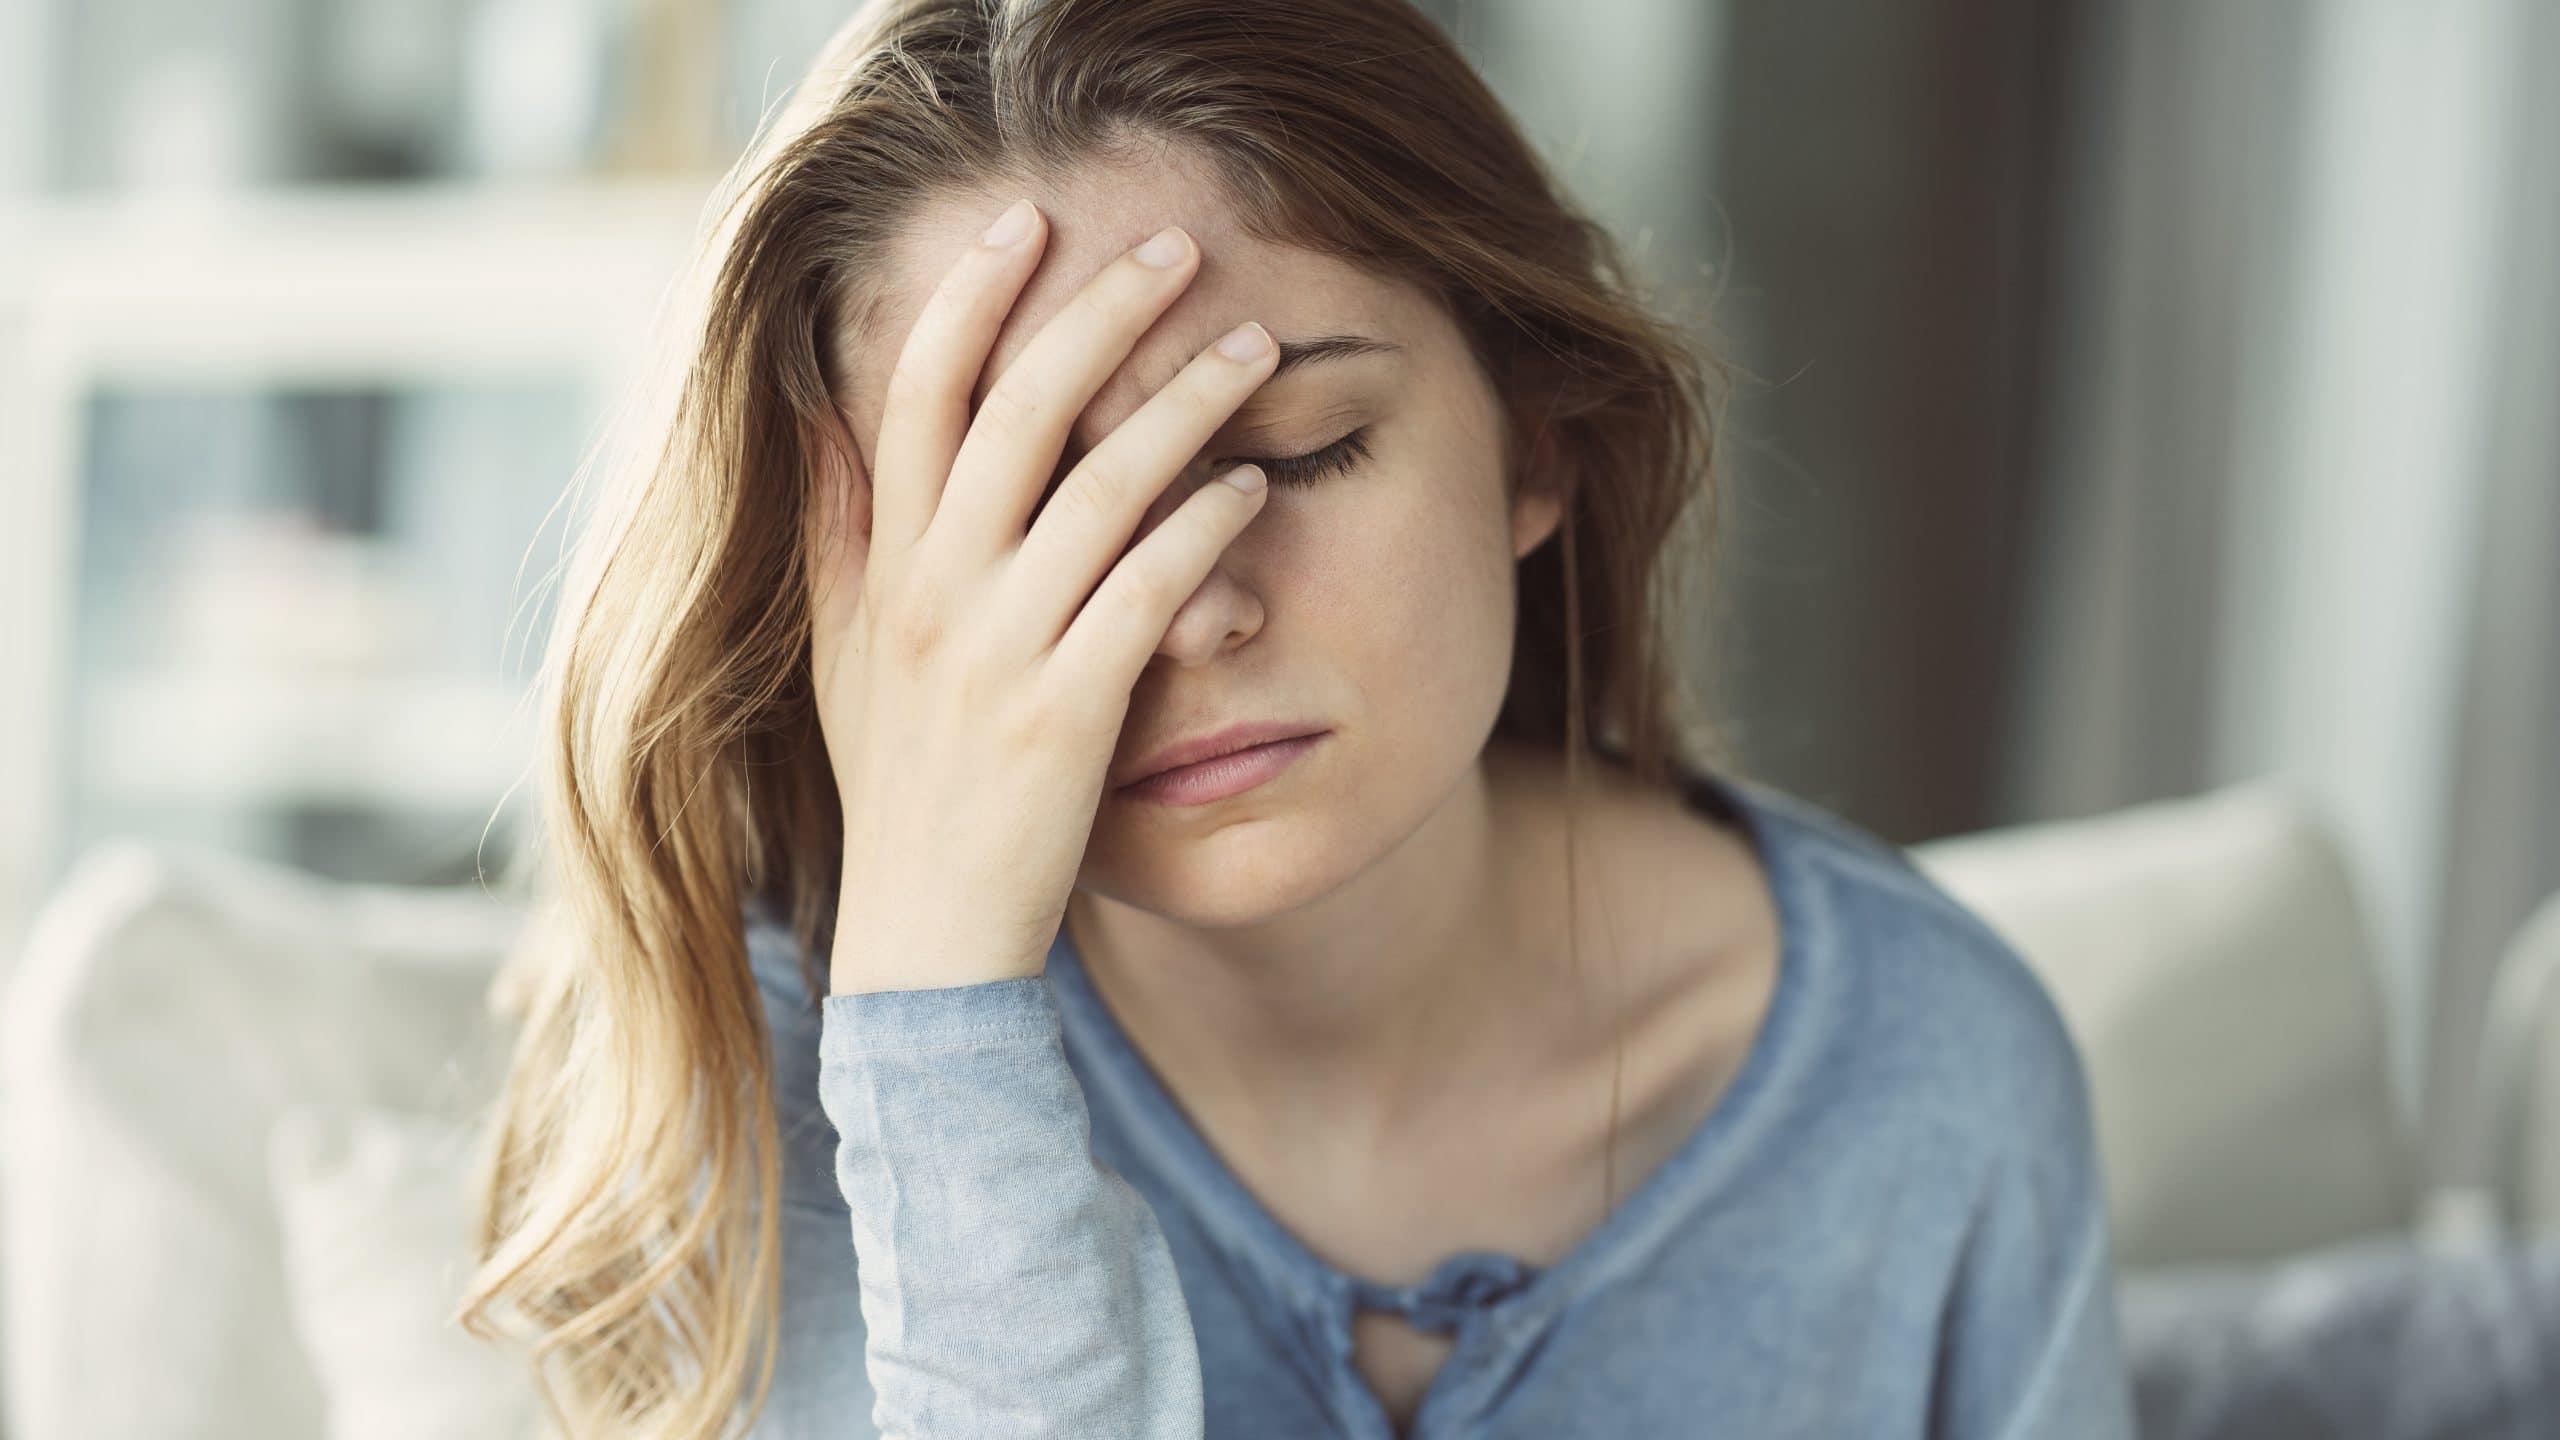 high-functioning depression